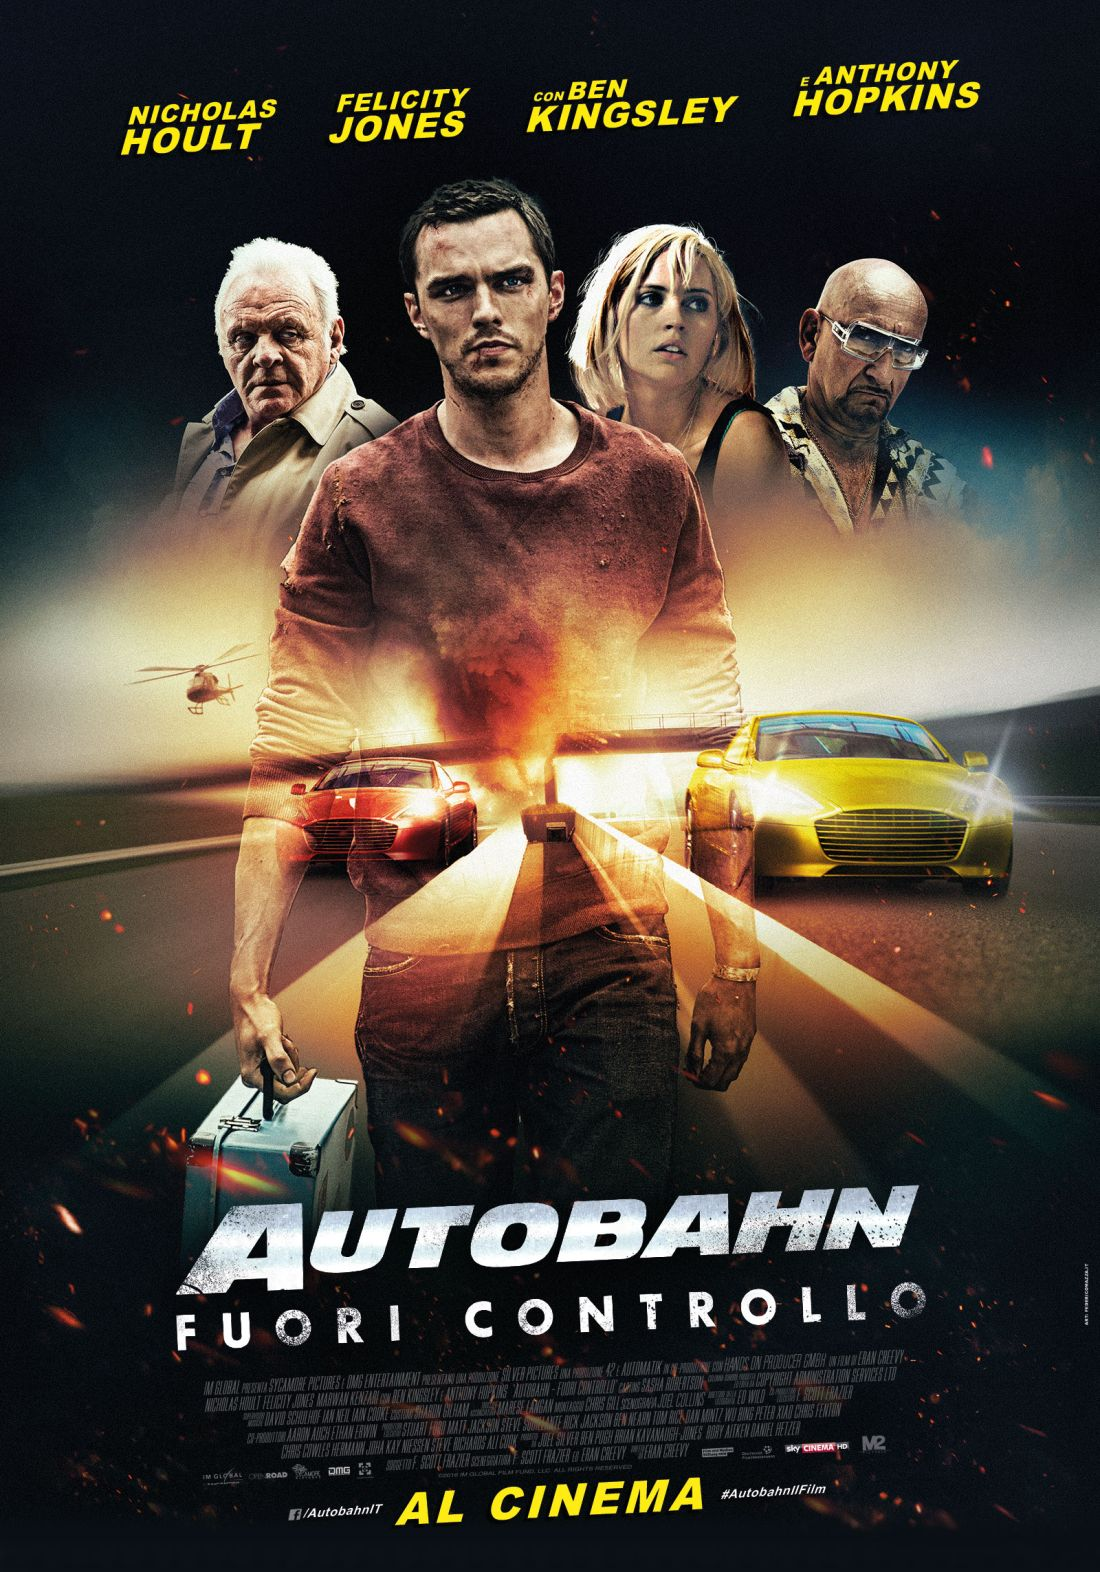 https://movieplayer.it/film/autobahn-fuori-controllo_36741/